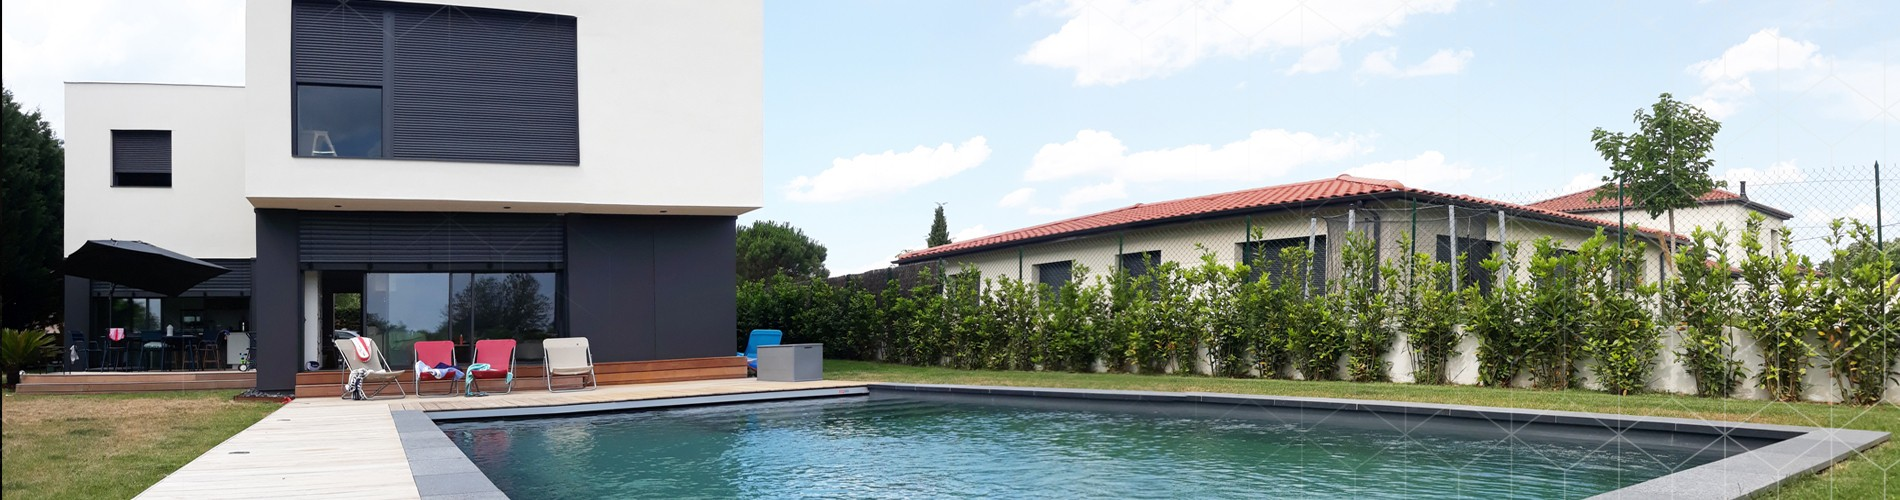 Maison Contemporaine Toit Terrasse actu asb architecte - maison contemporaine toit terrasse